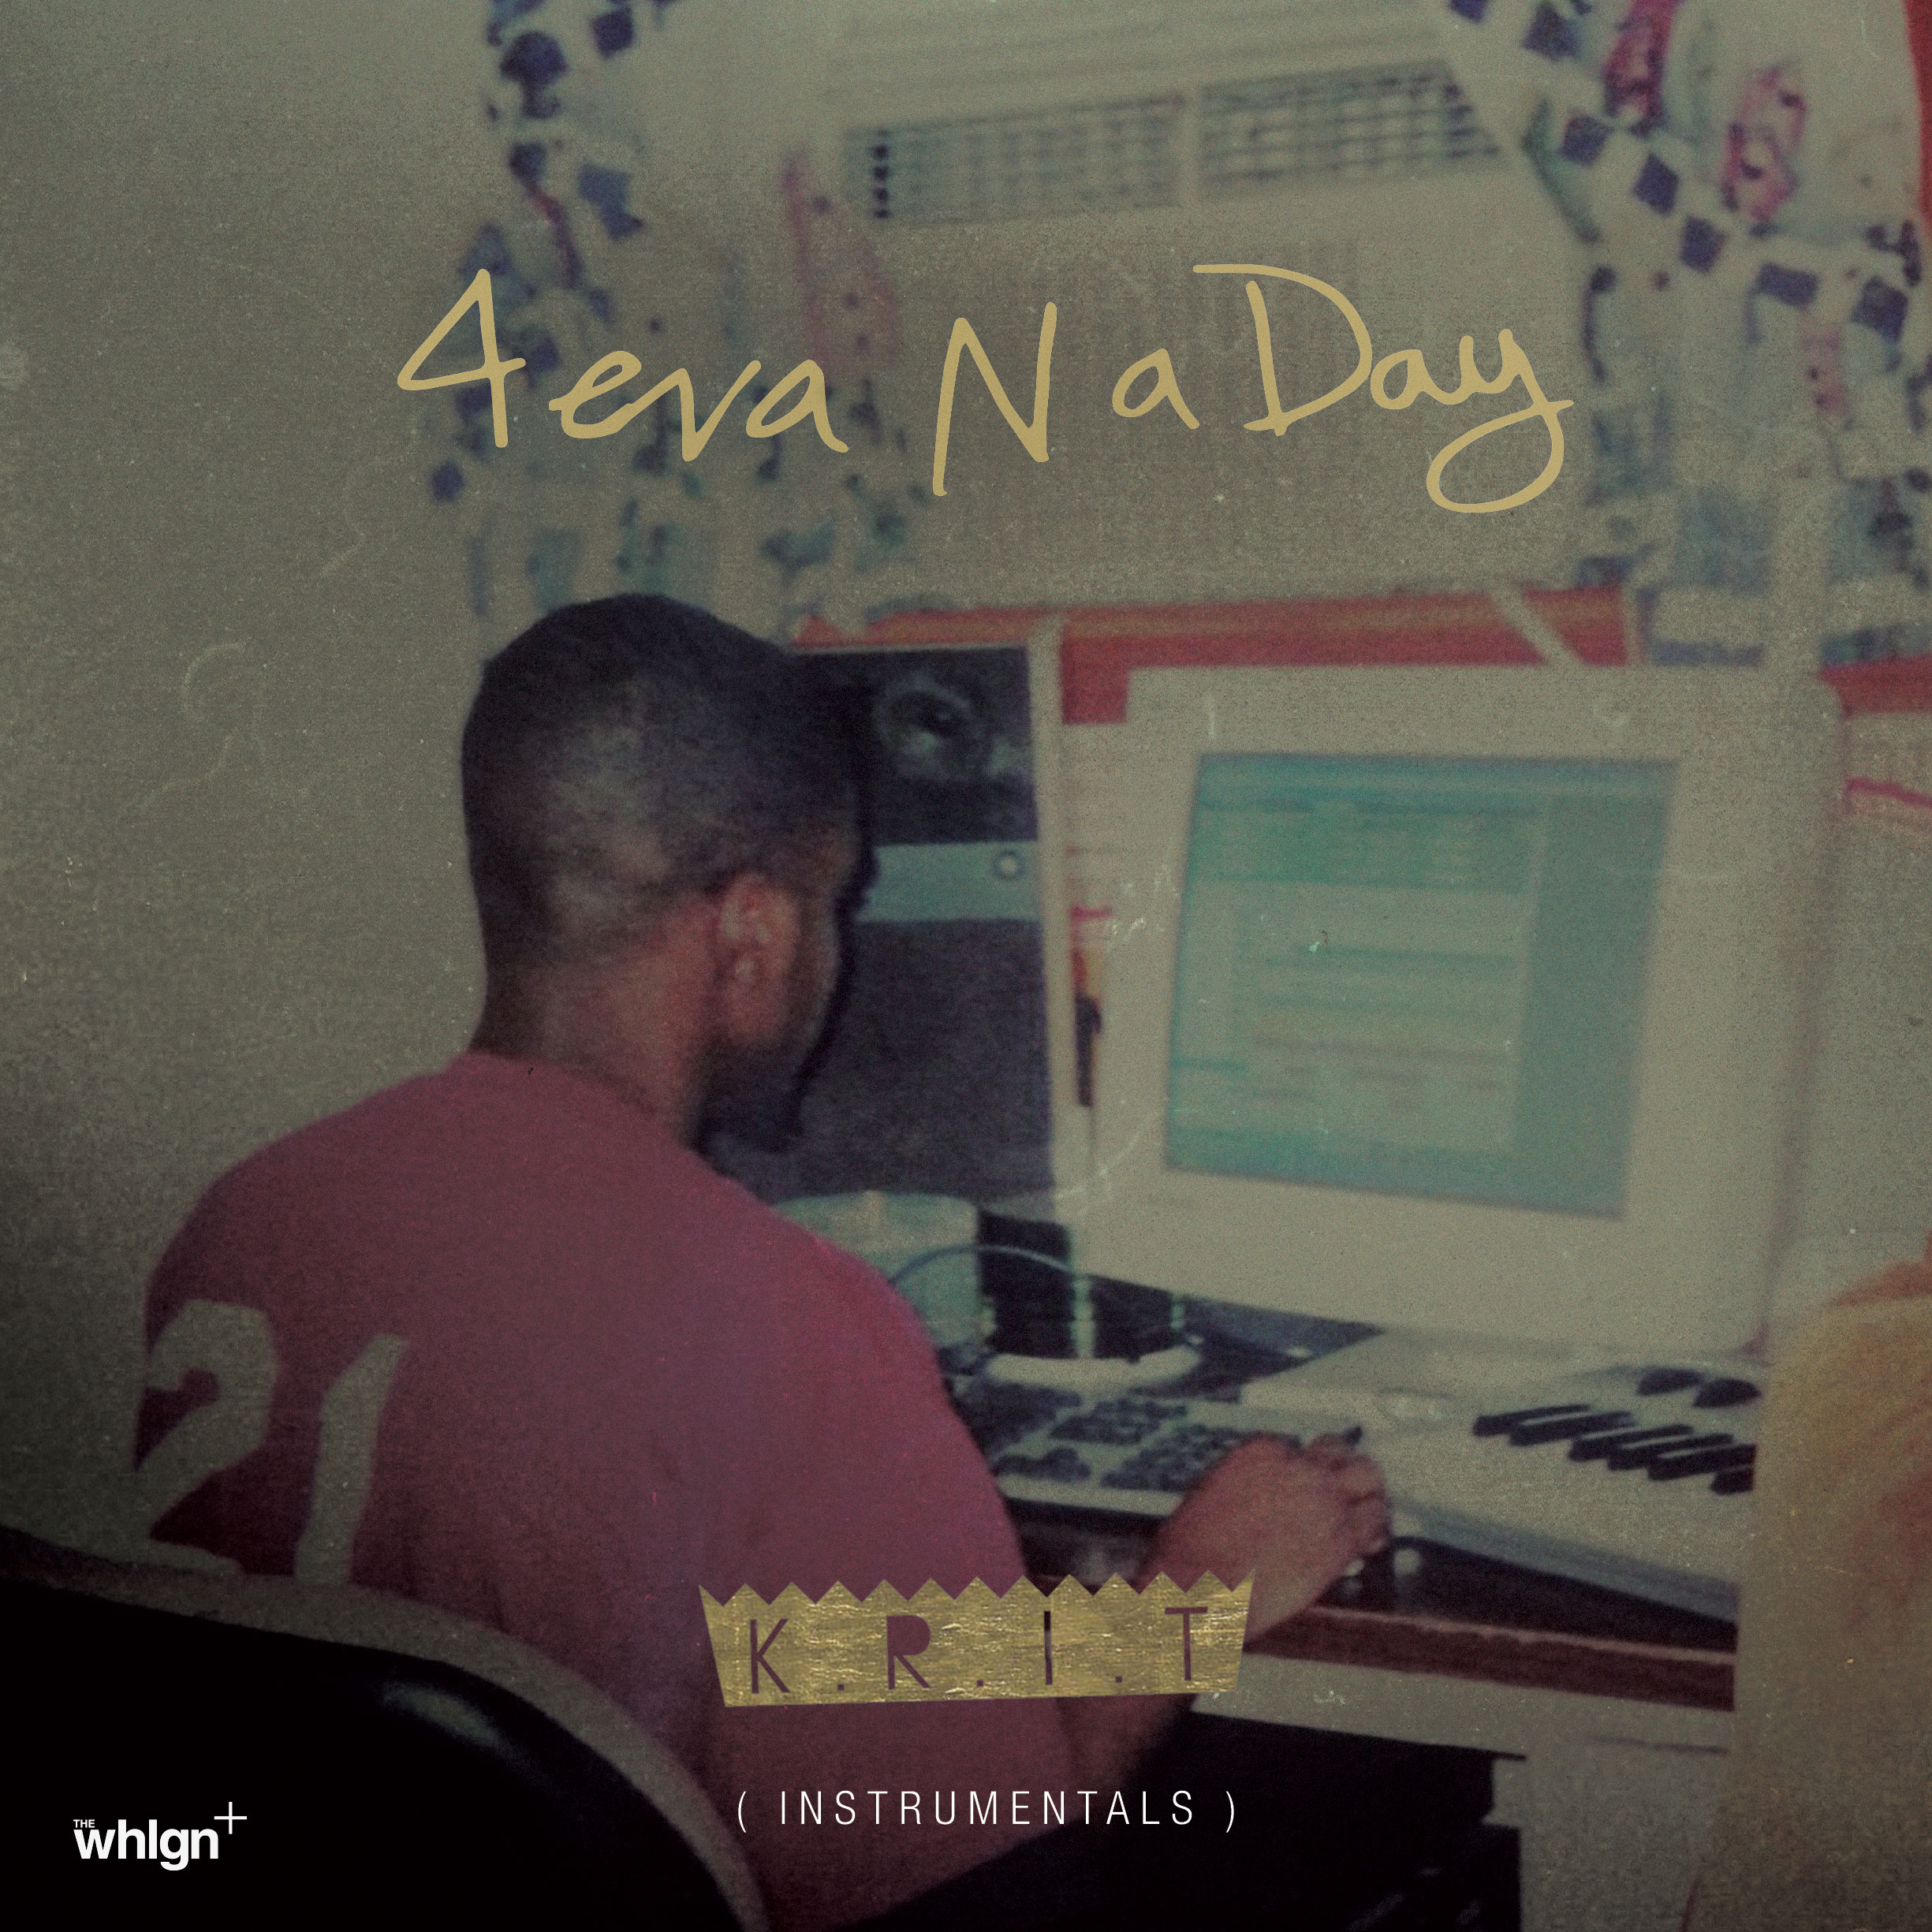 Big K R I T  - 4evaNaDay (Instrumentals) - Big K R I T